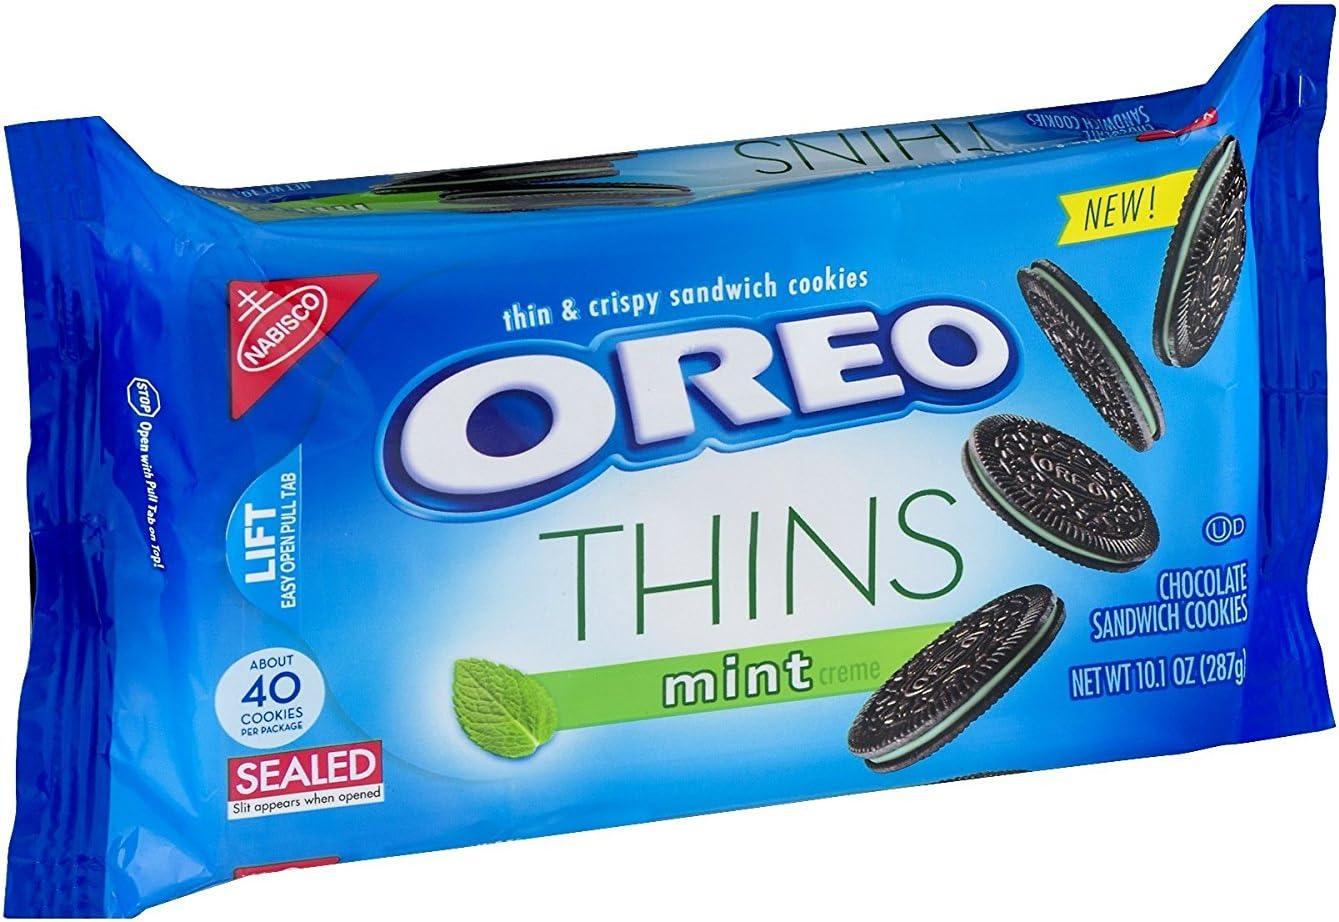 Nabisco, Oreo, Thins, 10.1oz Bag (Pack of 4) (Choose Flavors Below ...